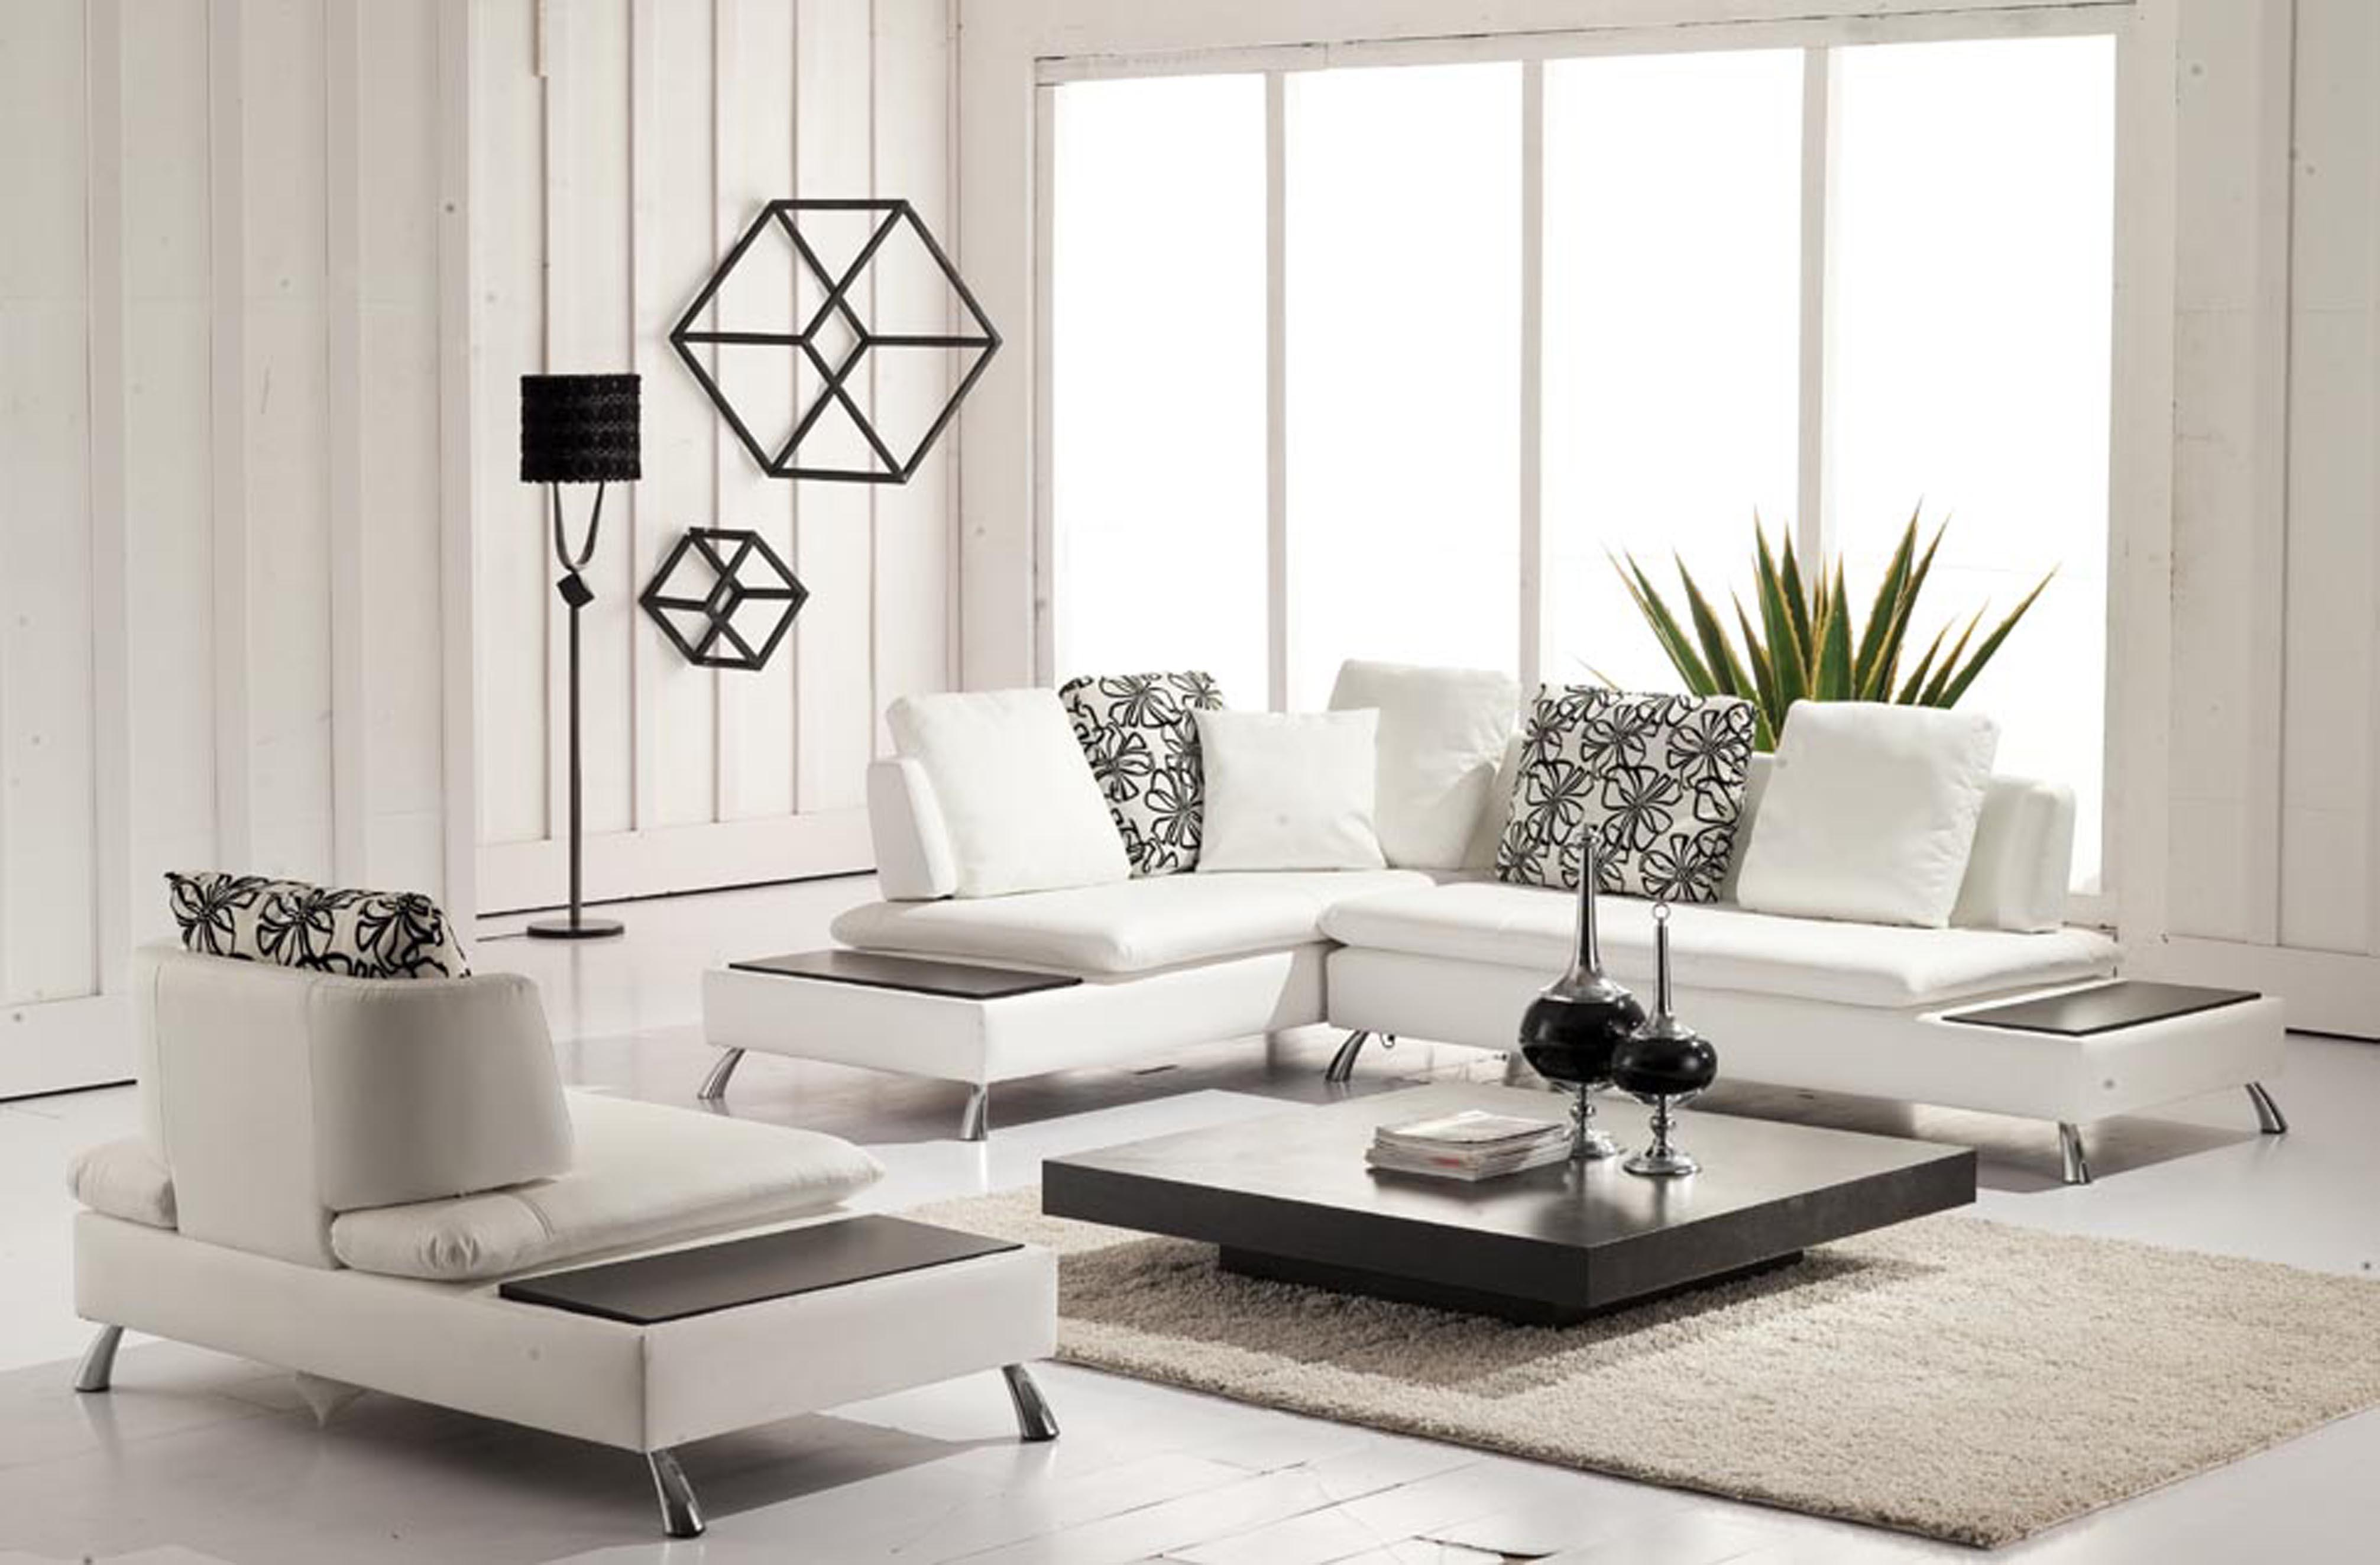 contemporary sofa sets india lodge صور اثاث مودرن احدث تصميمات شقق جديد عصري ميكساتك